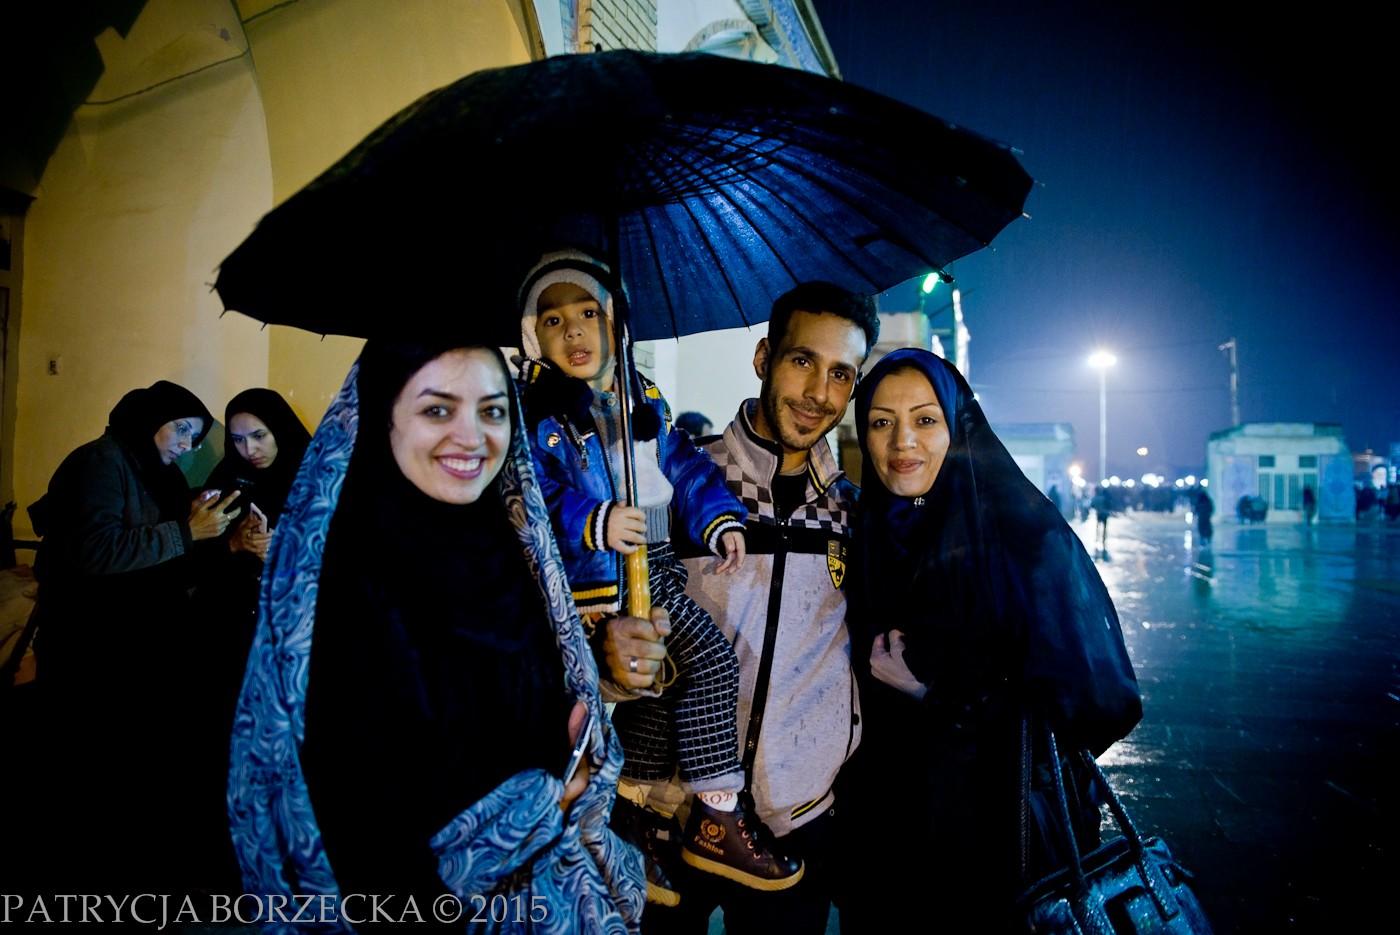 PatrycjaBorzecka-photography-Iran-people11